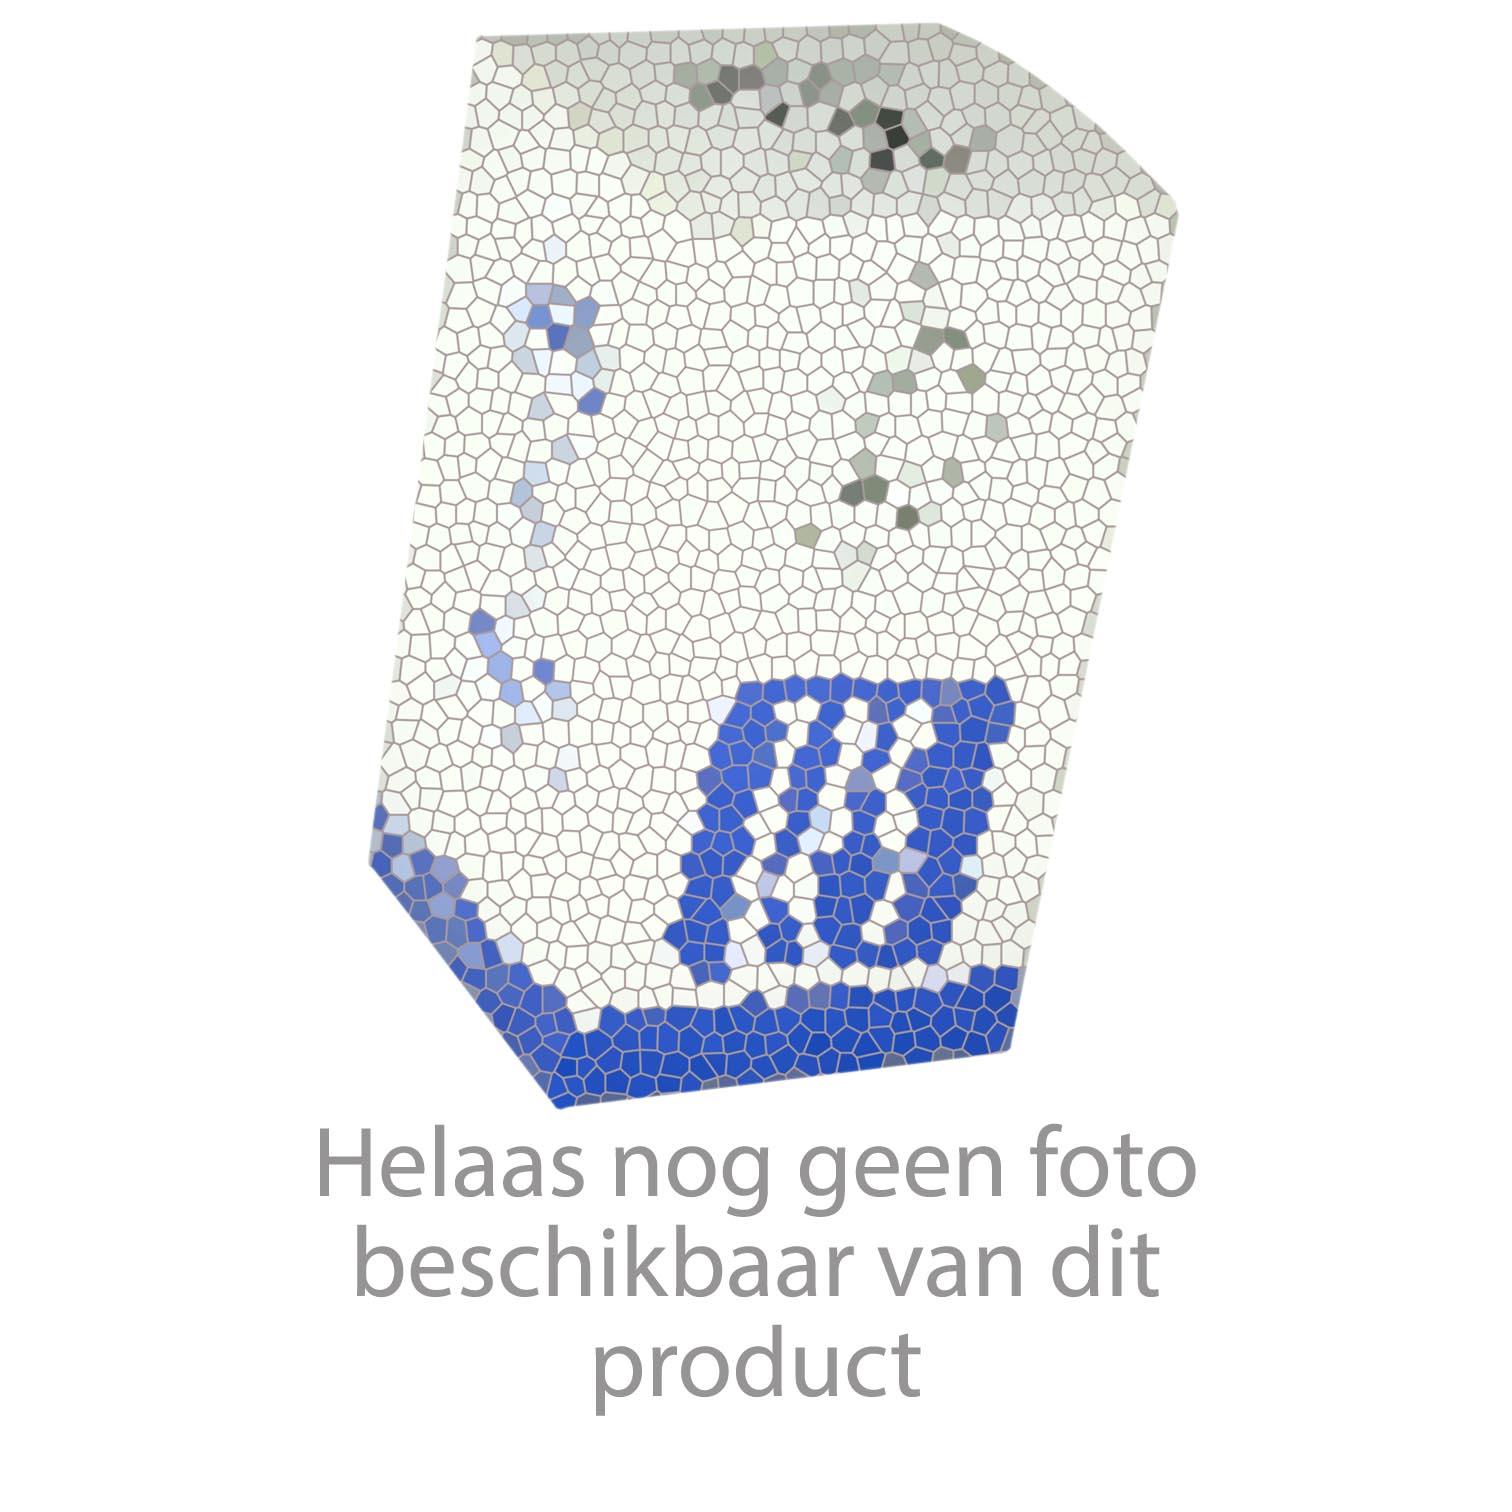 Grohe onderdelen Atrio One 2-Gats Wastafelmengkraan Wand 220 Mm 19918000